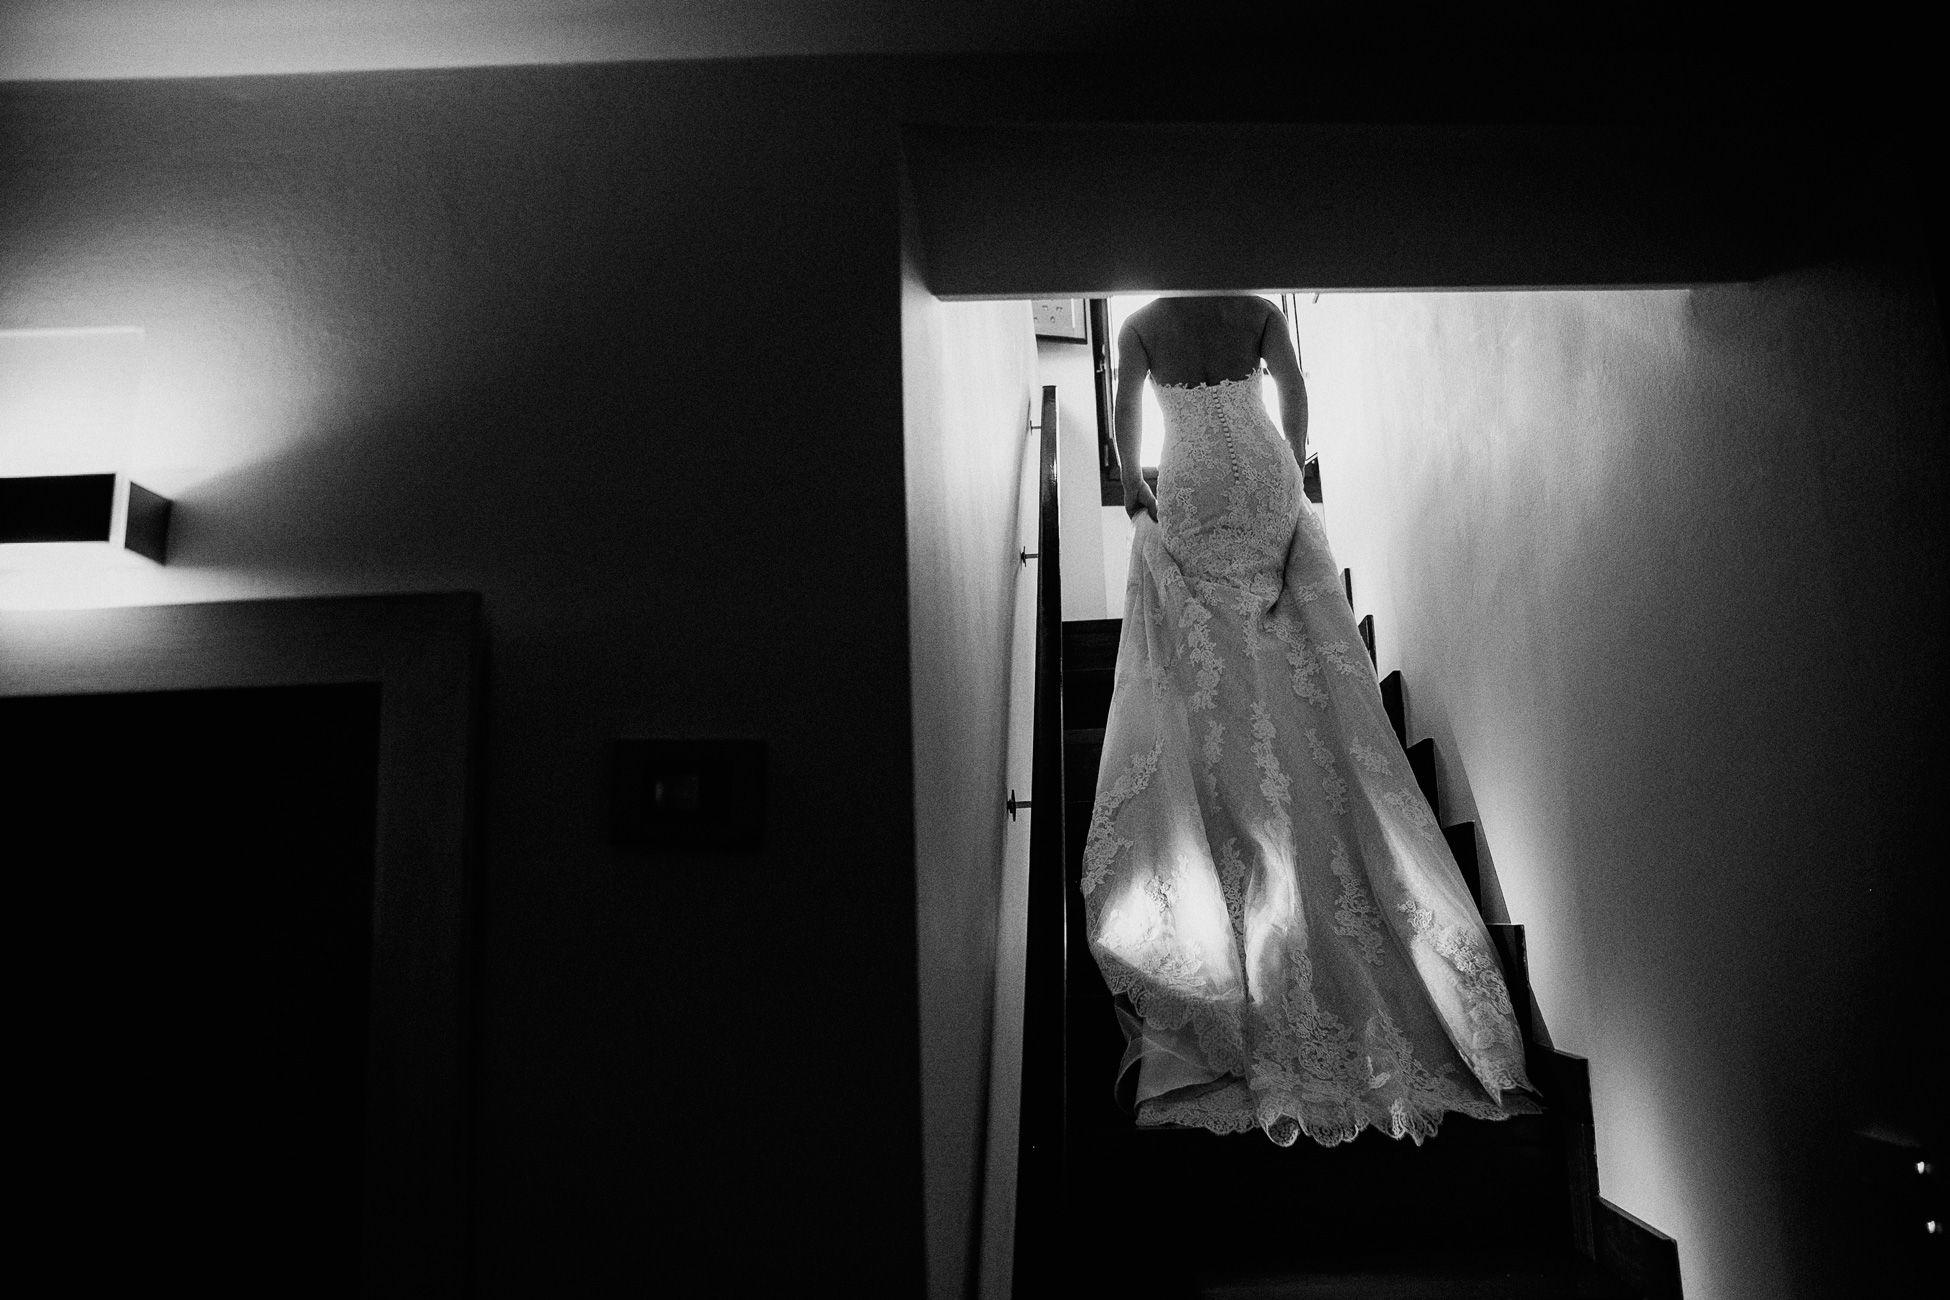 Boda en Granada - Wedding - Francis Rosso - wedding ideas - dress - view - flowers - vestido de novia - wedding - bodas - fotografo - parejas - couple - photography